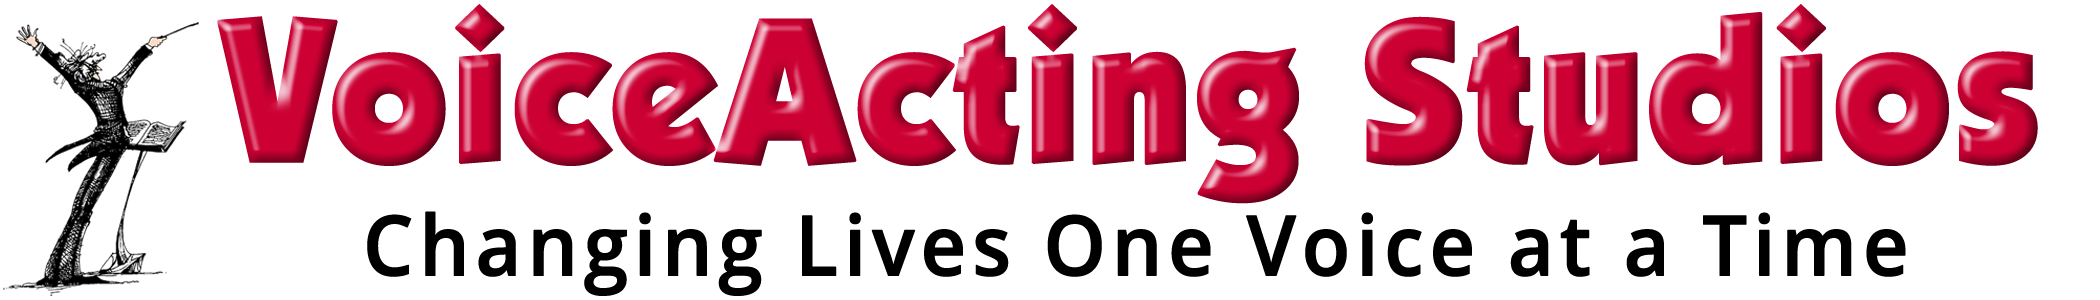 VoiceActing Academy